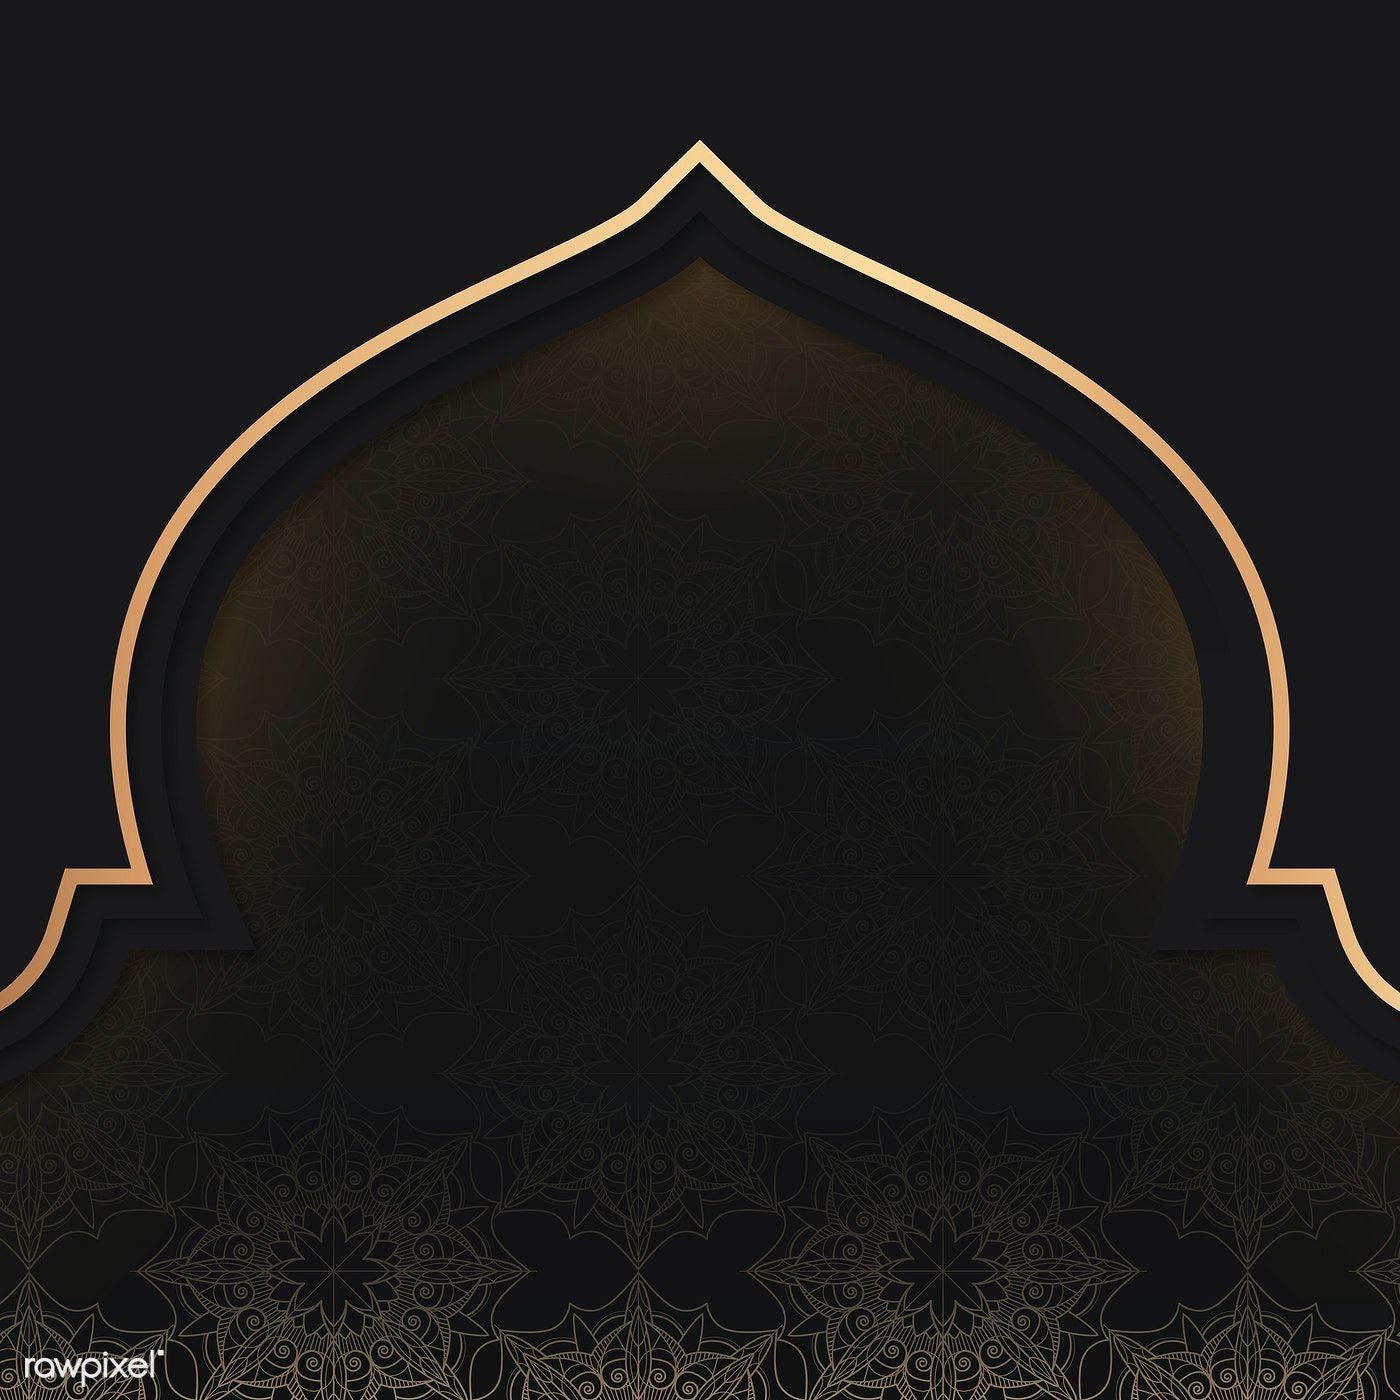 Golden Eid Mubarak Frame Design Vector Free Image By Rawpixel Com Aew Desain Banner Kartu Desain